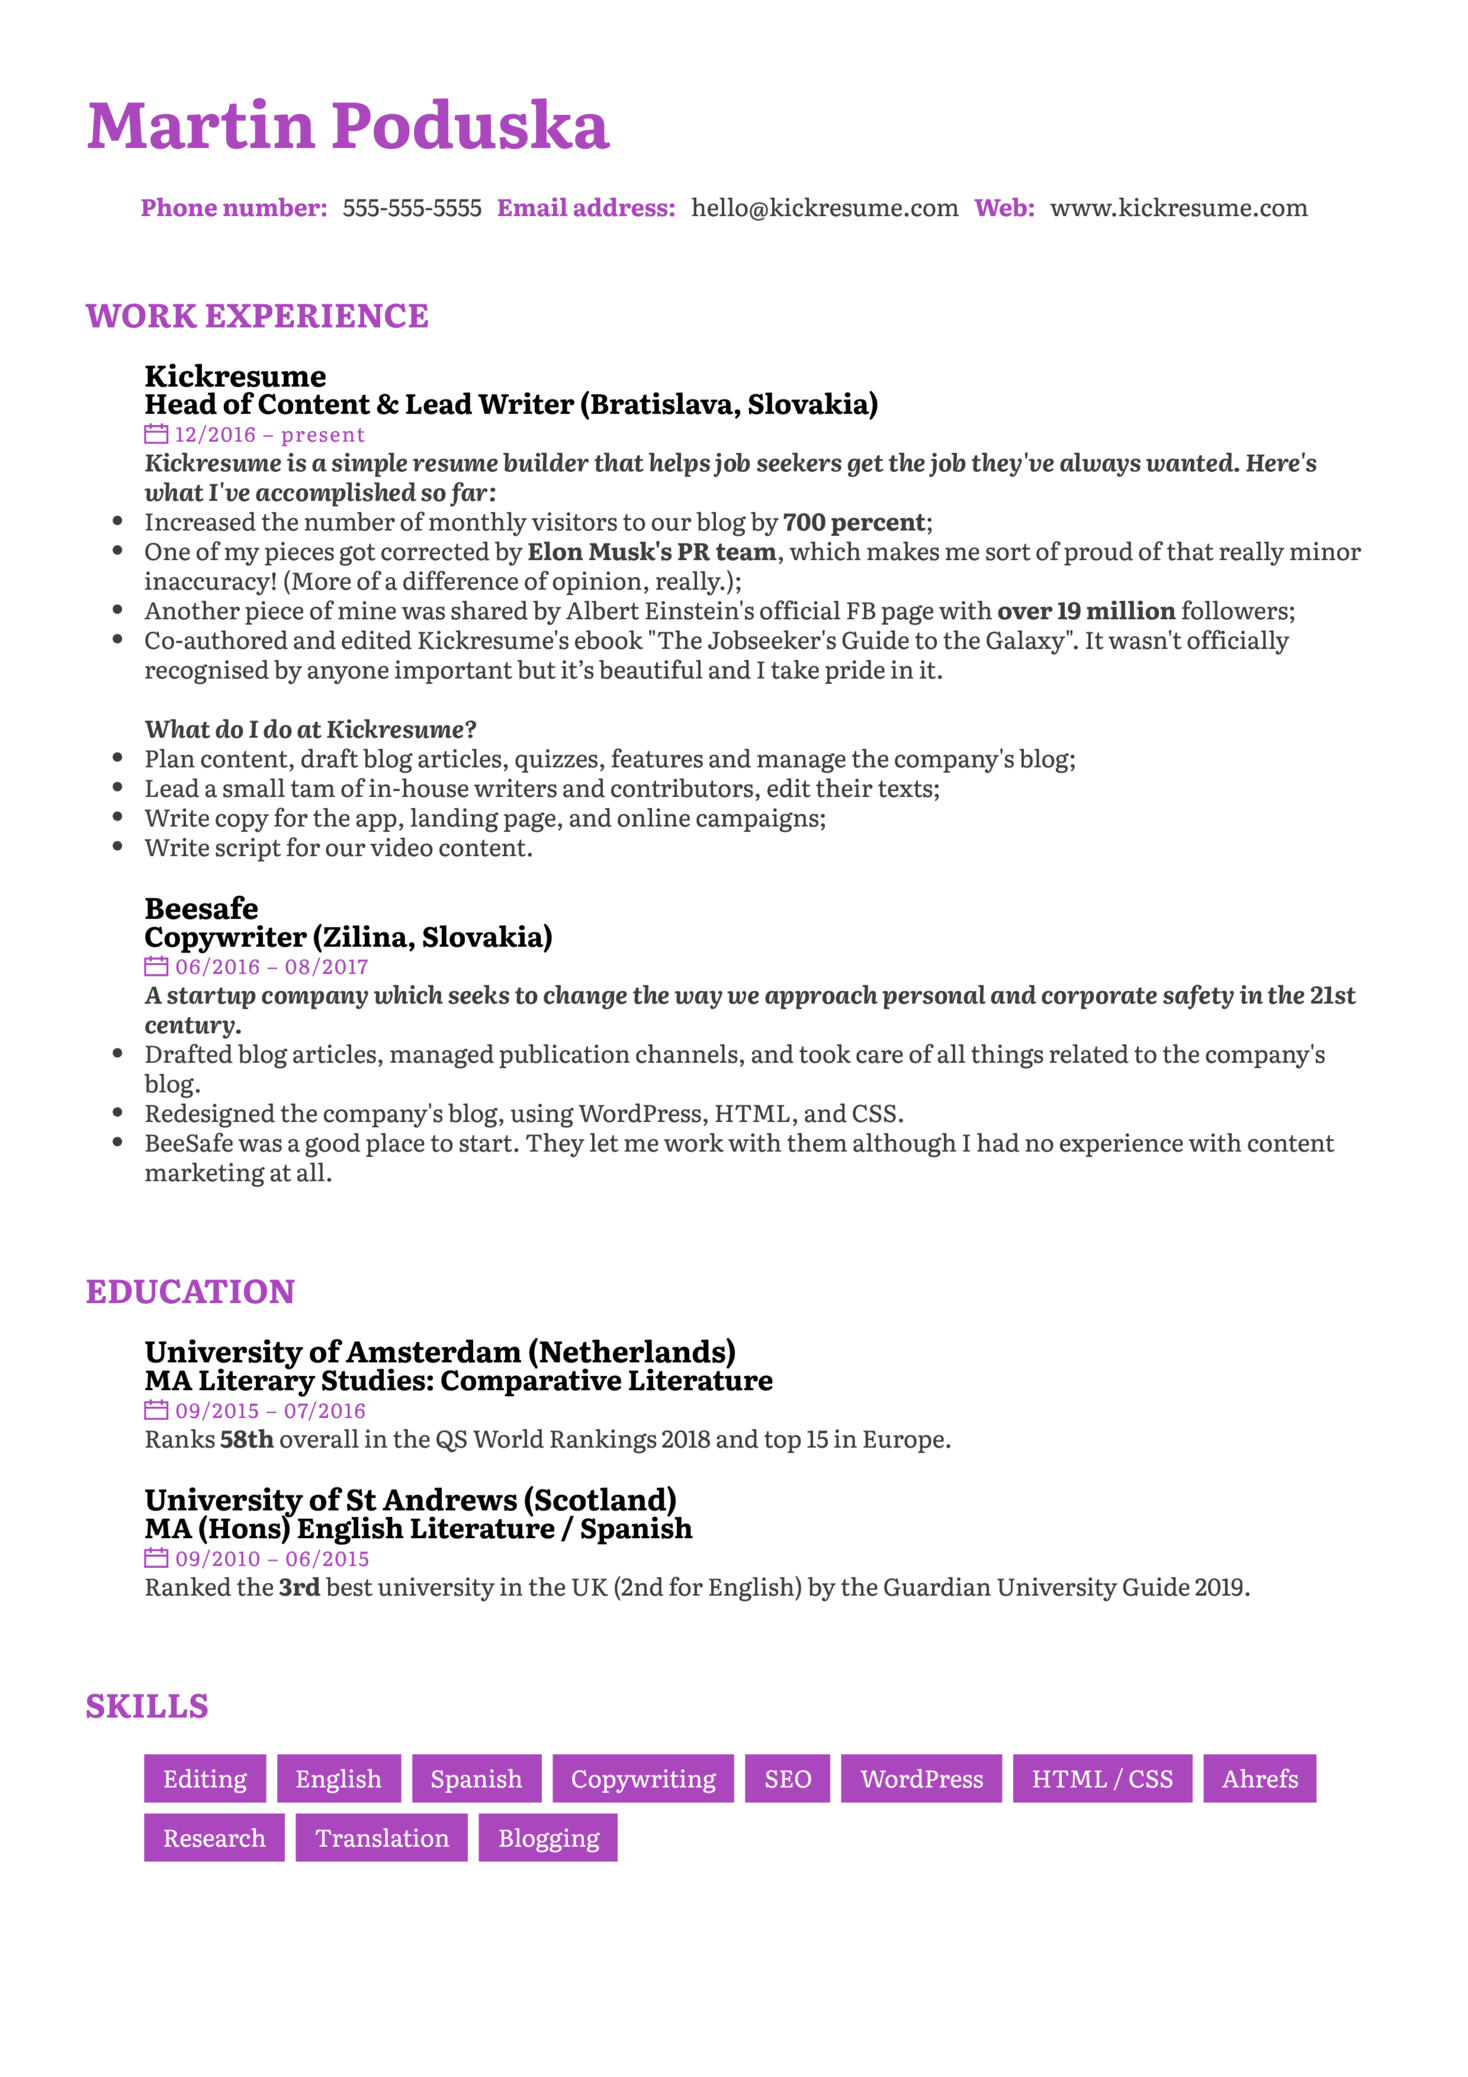 Senior Copywriter Resume Sample (Teil 1)